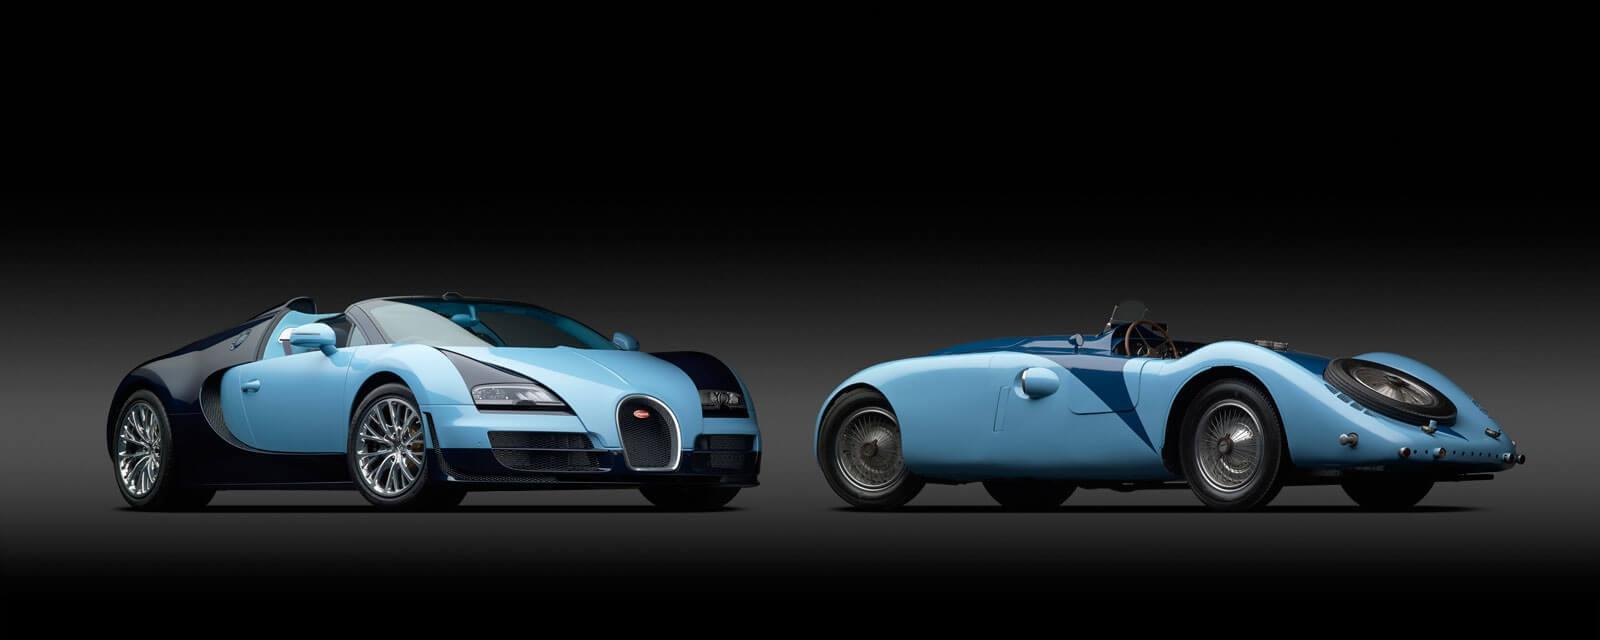 bugatti-veyron-jean-pierre-wimille-legends-edition-Bugatti-Veyron-Jean-Pierre-Wimille-wallpaper-wp3403553